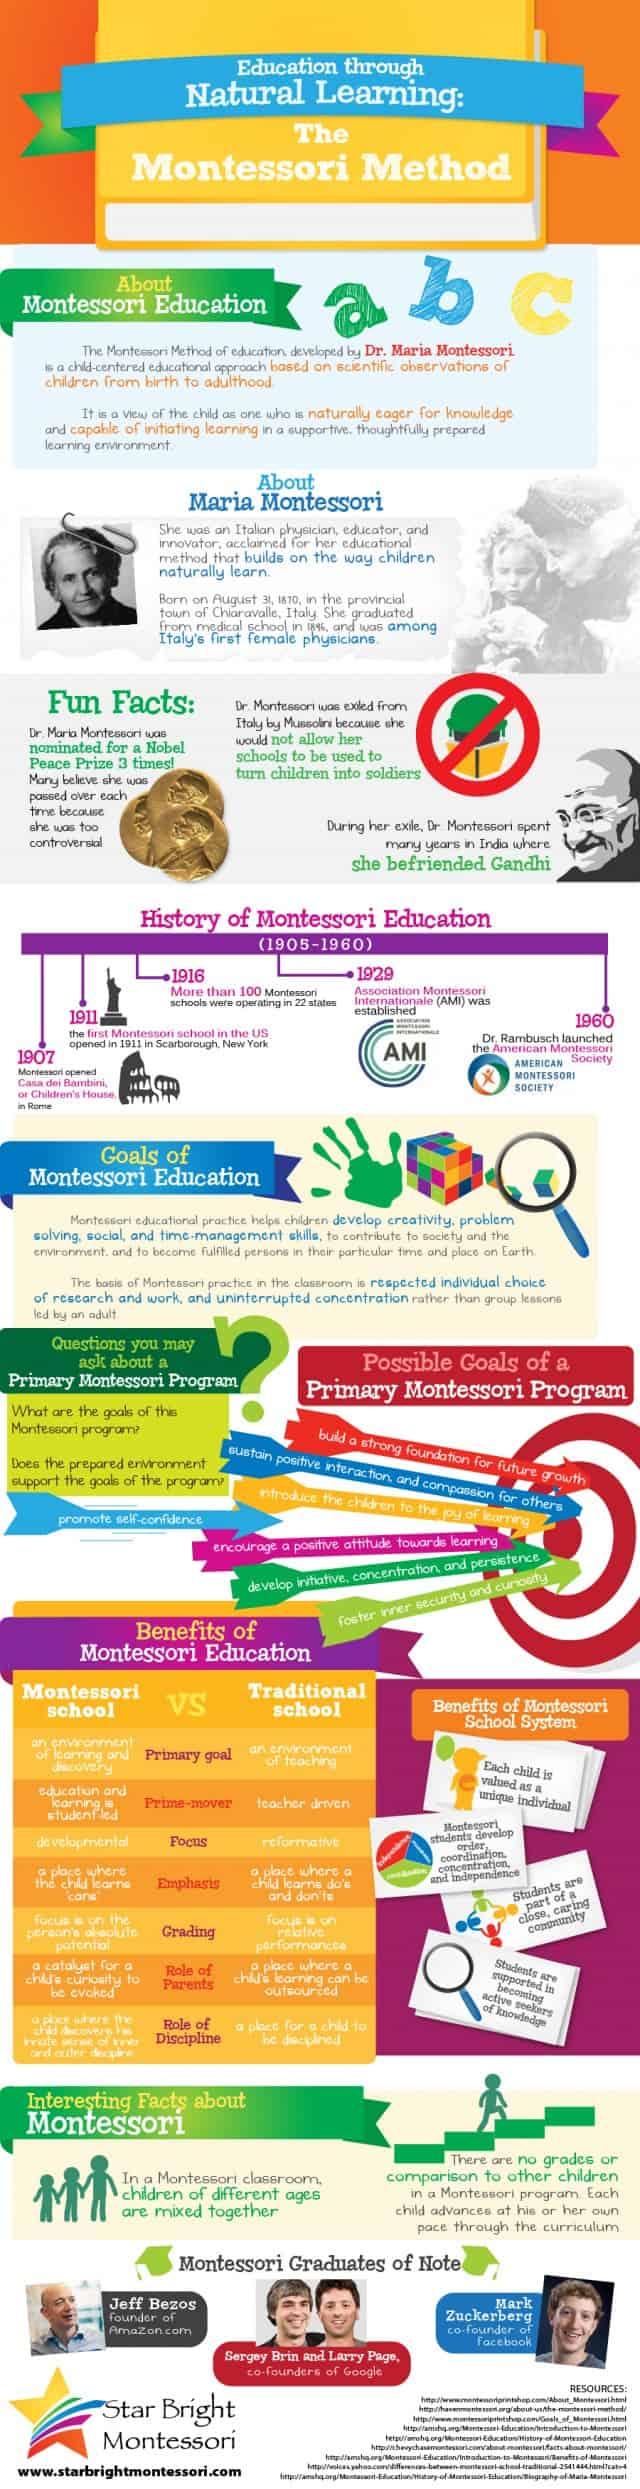 Montessori Method Infographic